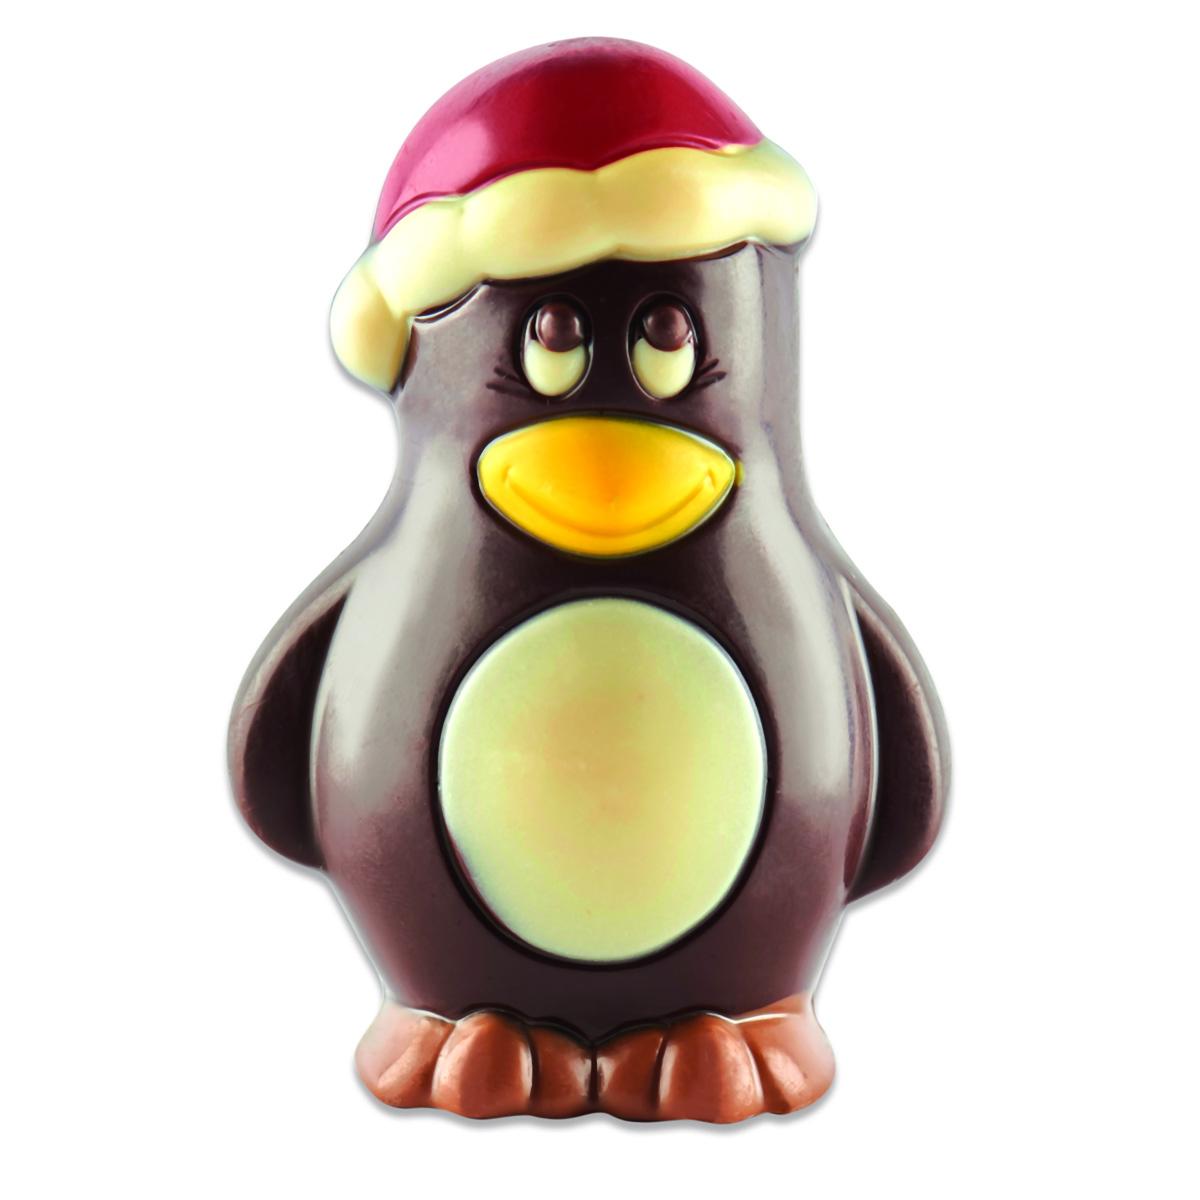 Pingouin chocolat noir, chocolaterie Schaal (50 g)